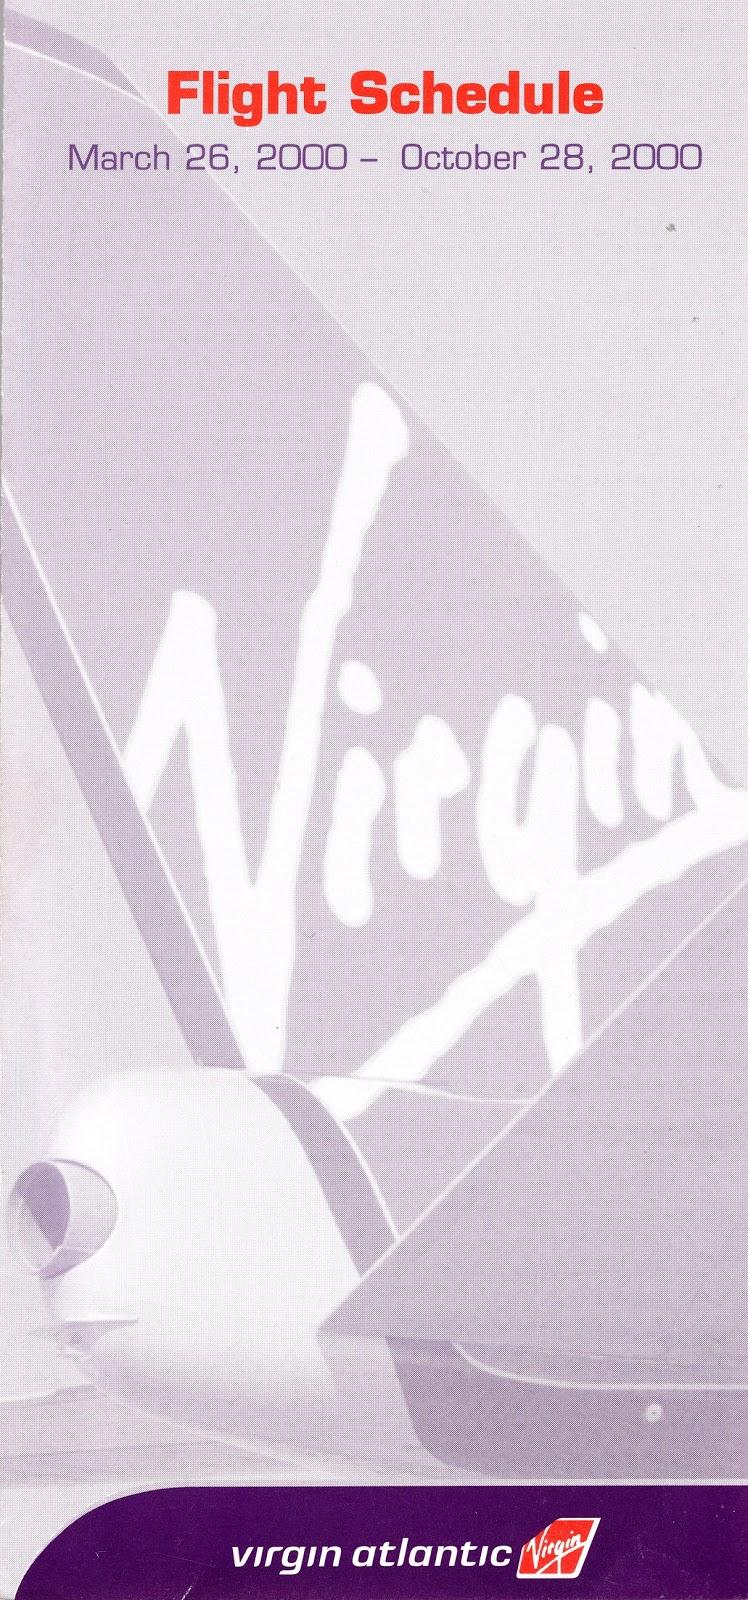 Airline Timetables: Virgin Atlantic - March, 2000